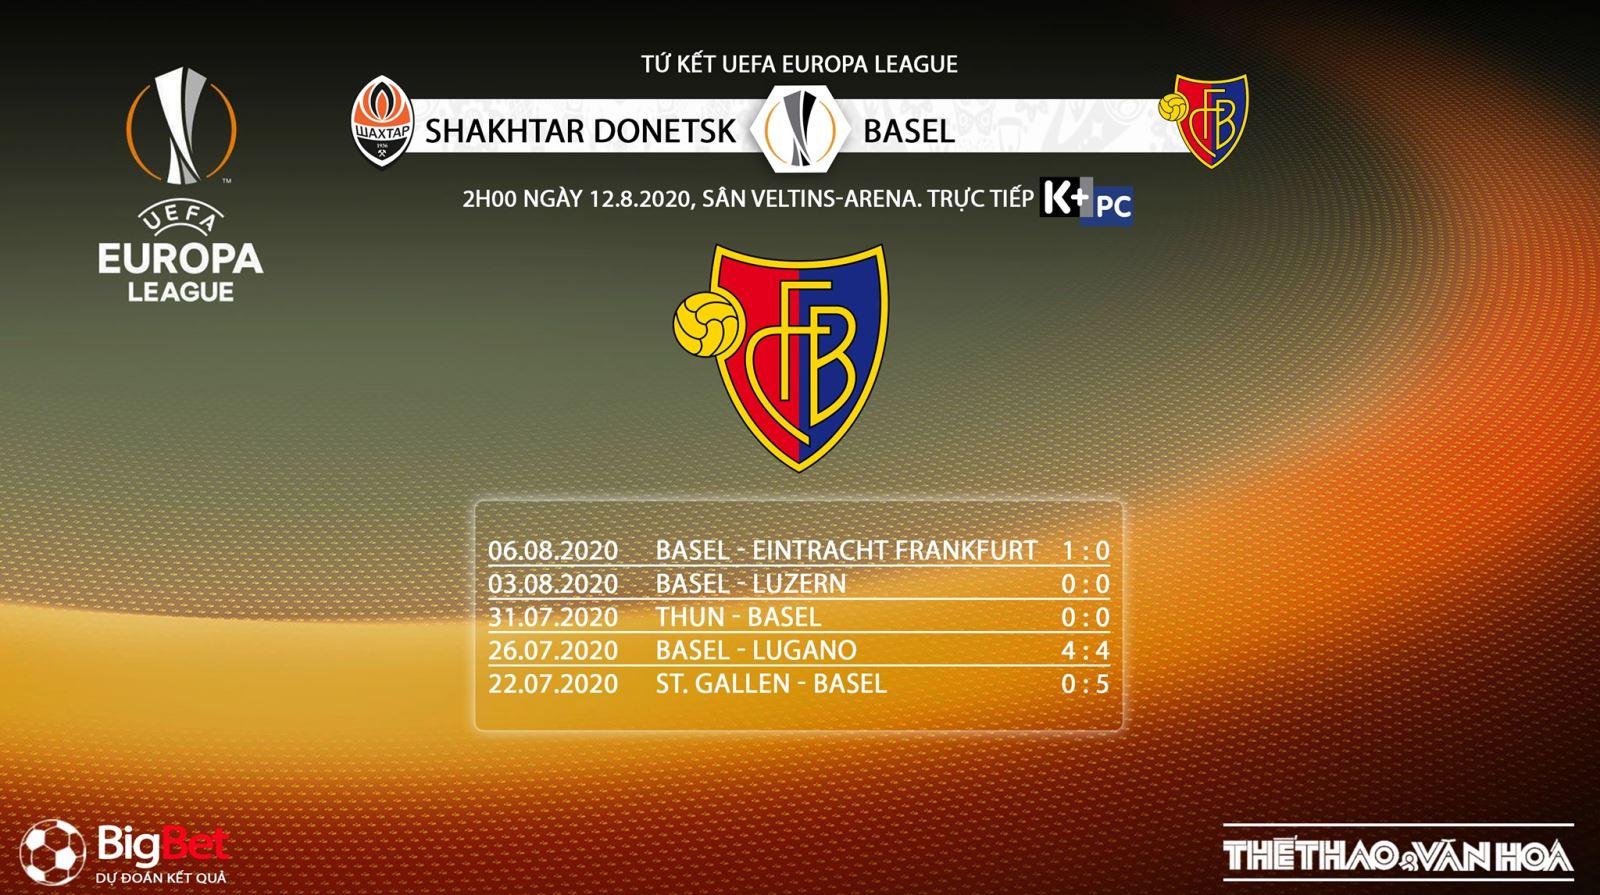 Shaktar Donetsk vs Basel, trực tiếp bóng đá, trực tiếp Shaktar Donetsk vs Basel, soi kèo, kèo bóng đá, kèo Shaktar Donetsk vs Basel, lịch thi đấu bóng đá